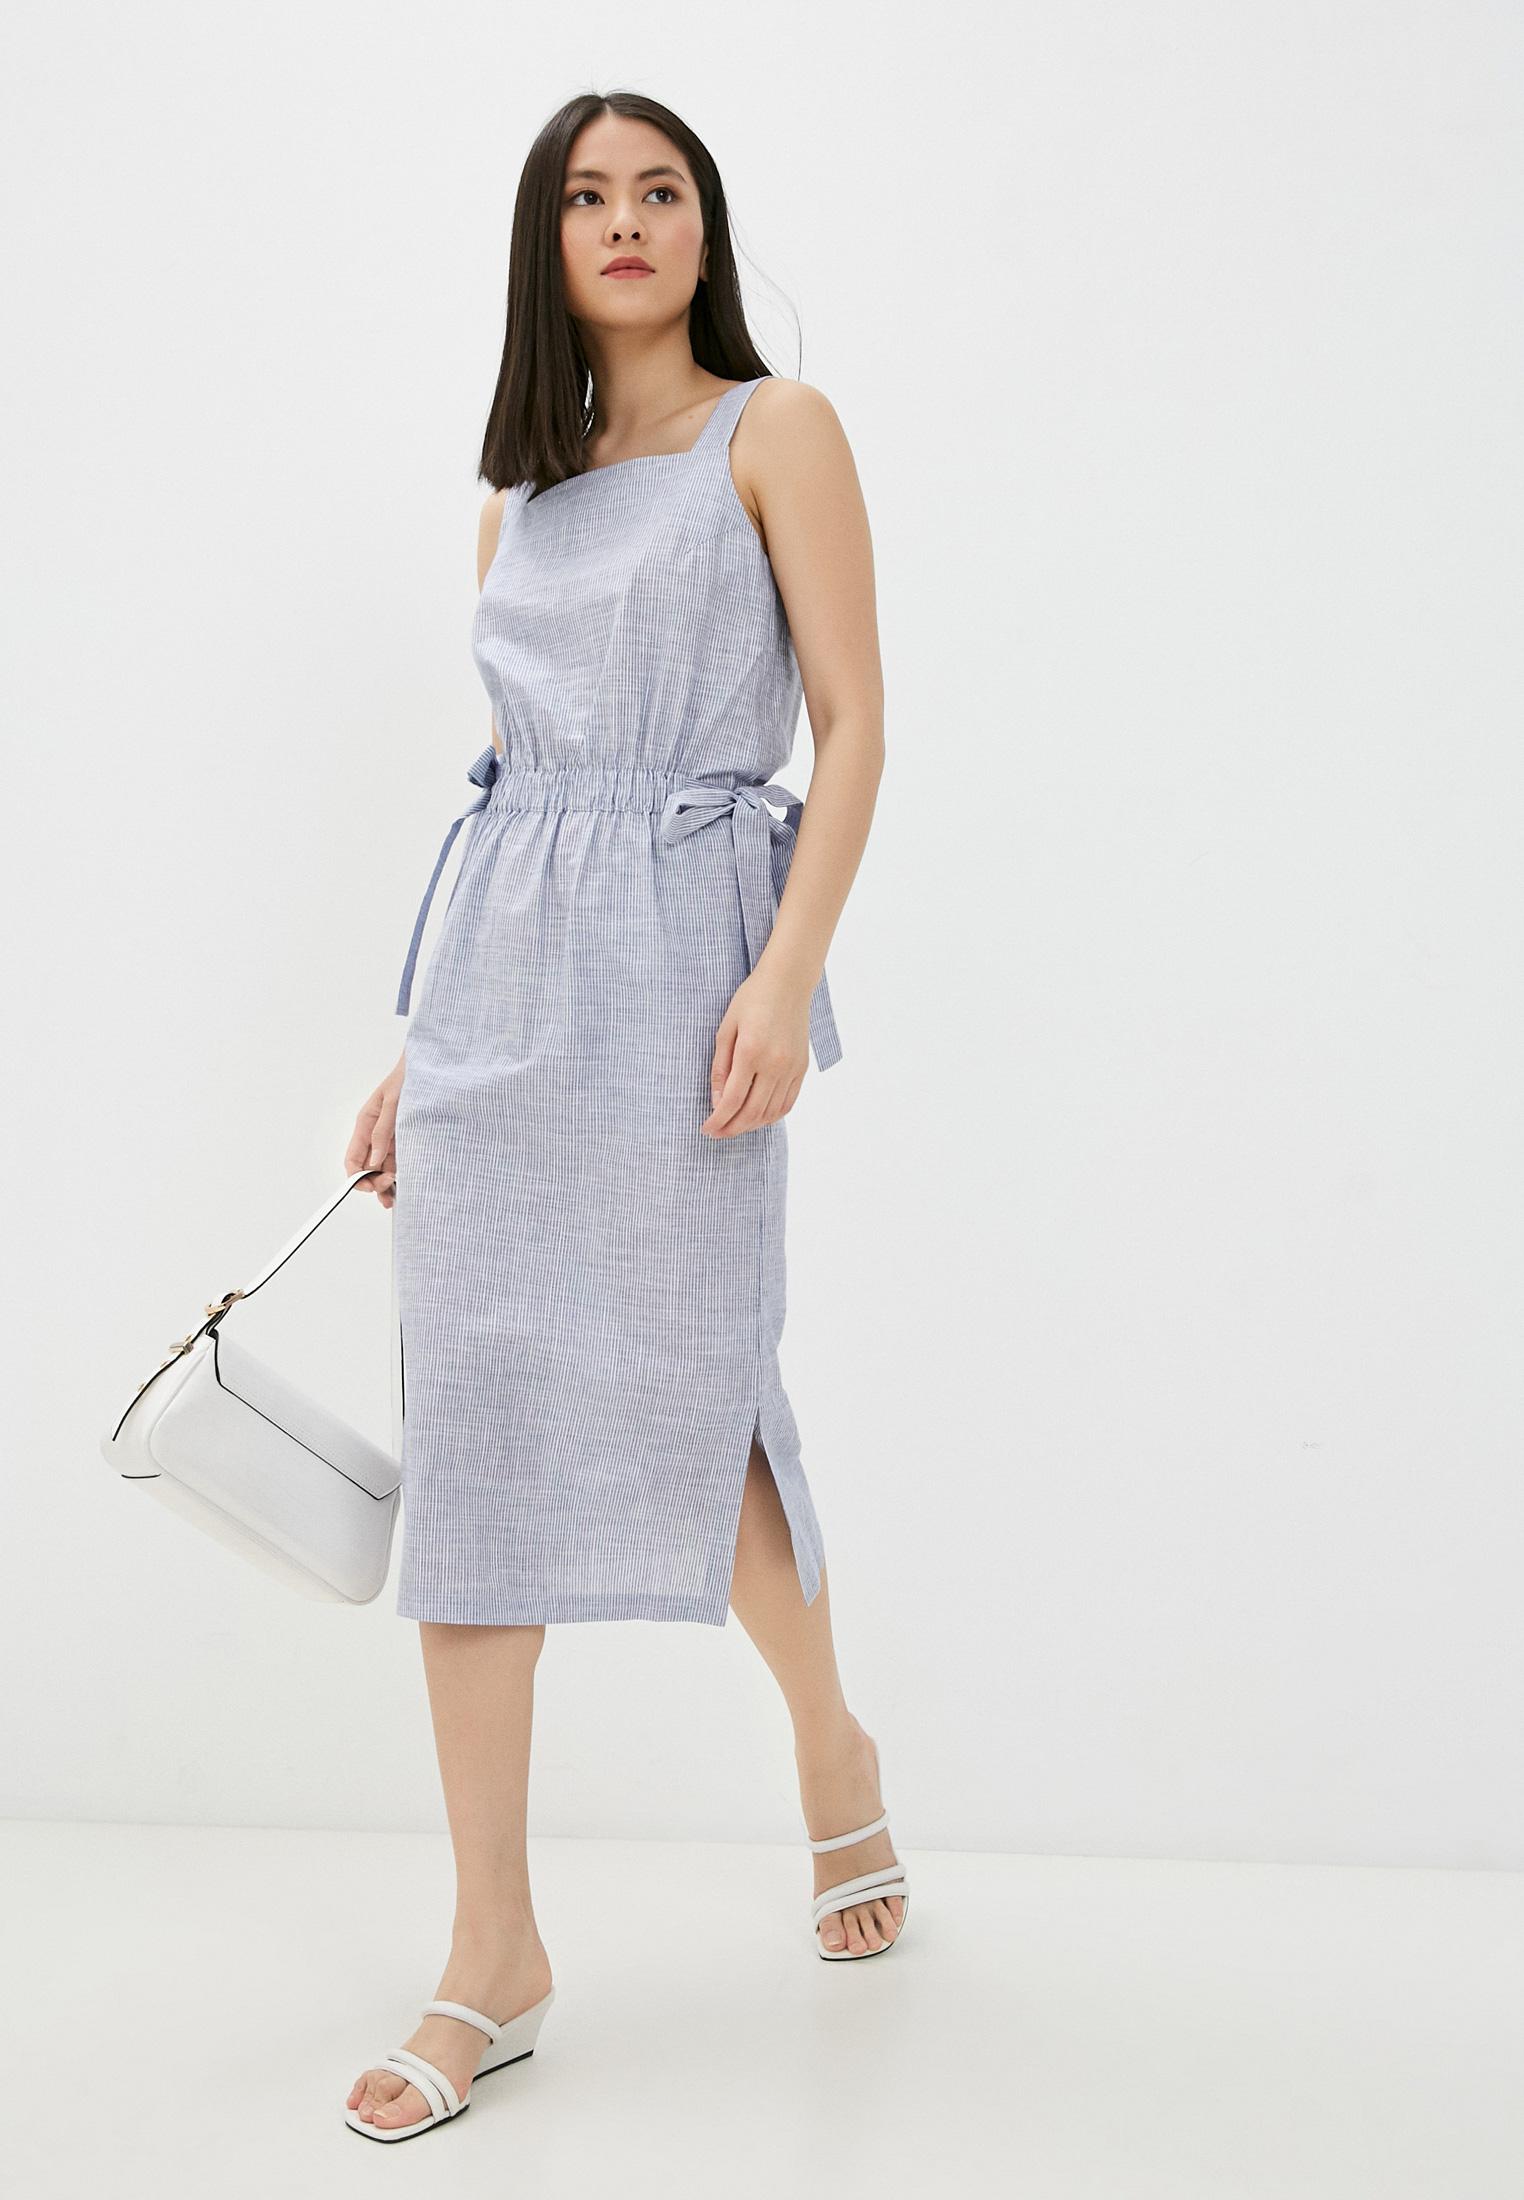 Женские платья-сарафаны SHARTREZ 803-П